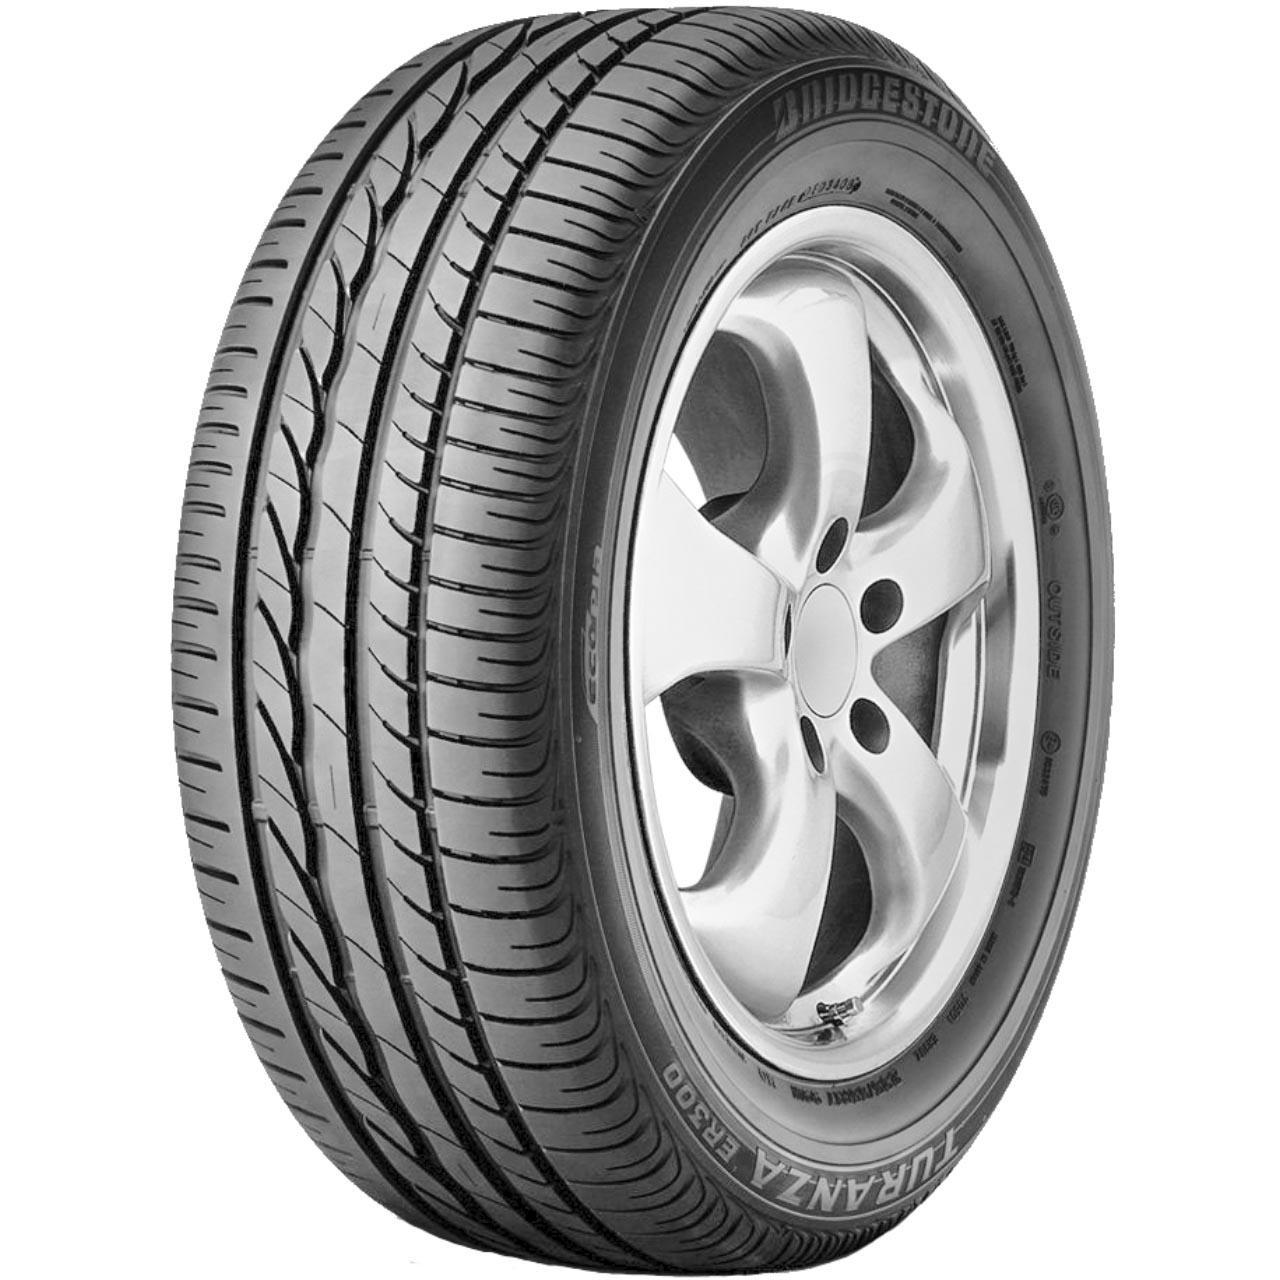 Bridgestone Turanza ER 300 225/45R17 91Y